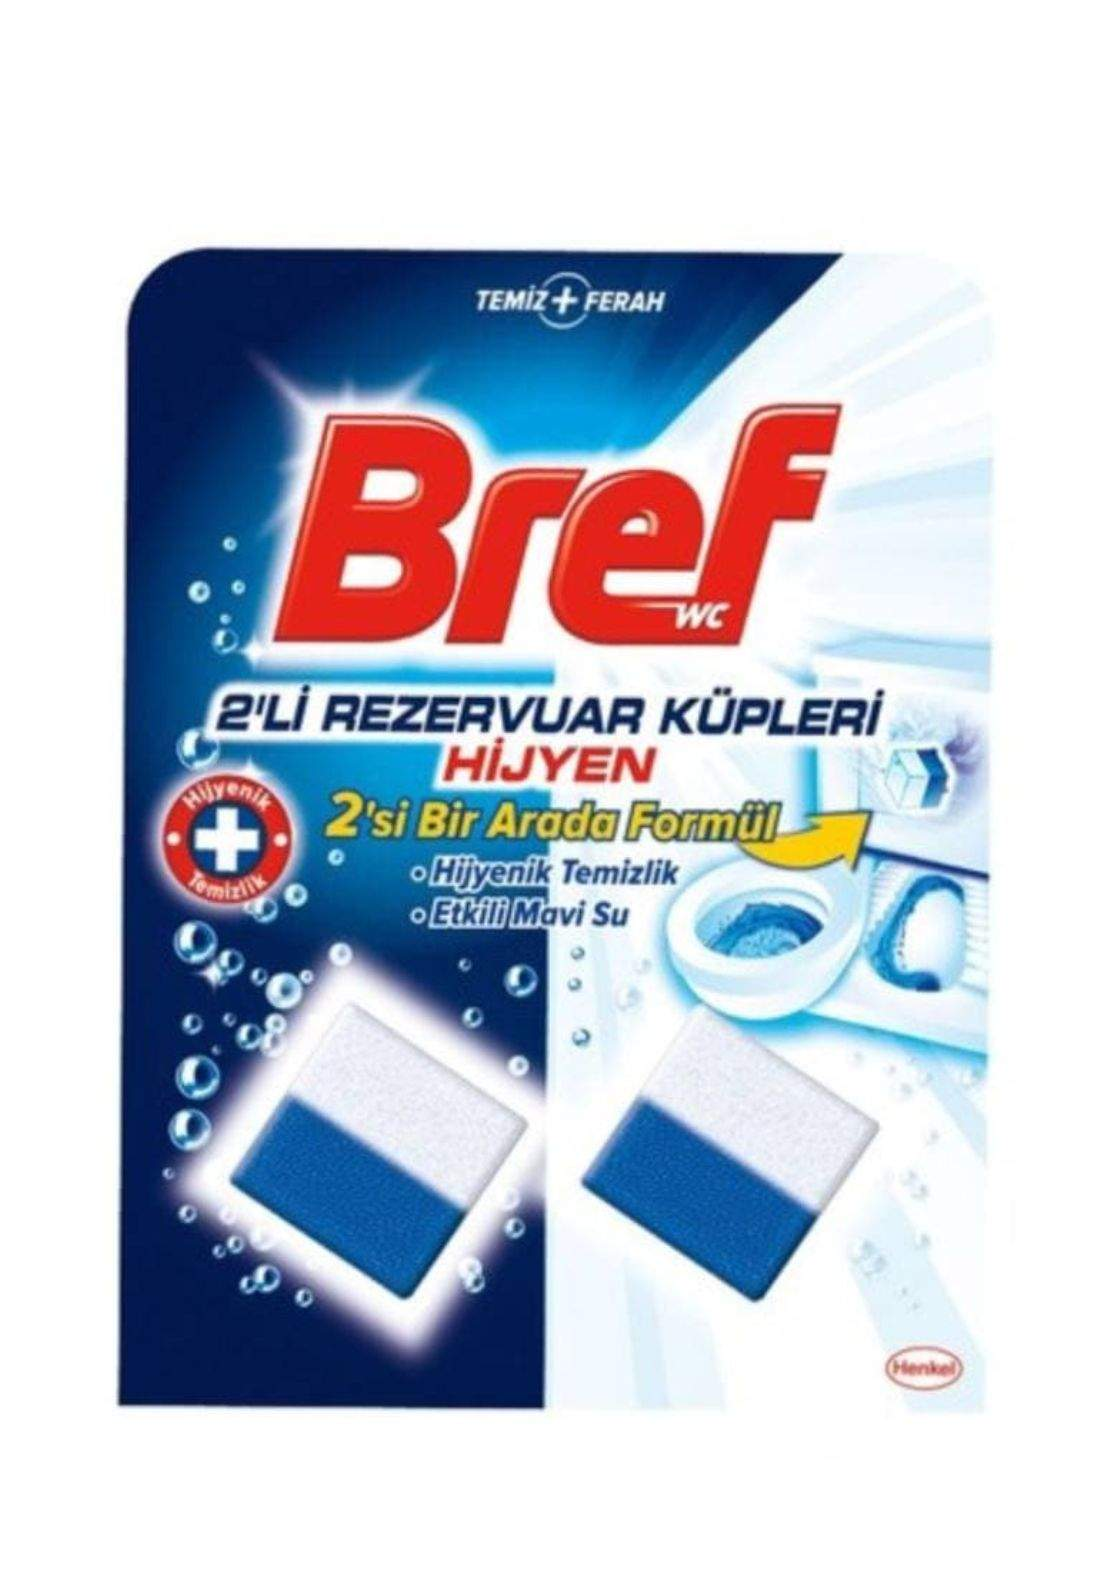 Bref toilet cube cleaner بريف مكعب تنظيف تواليت